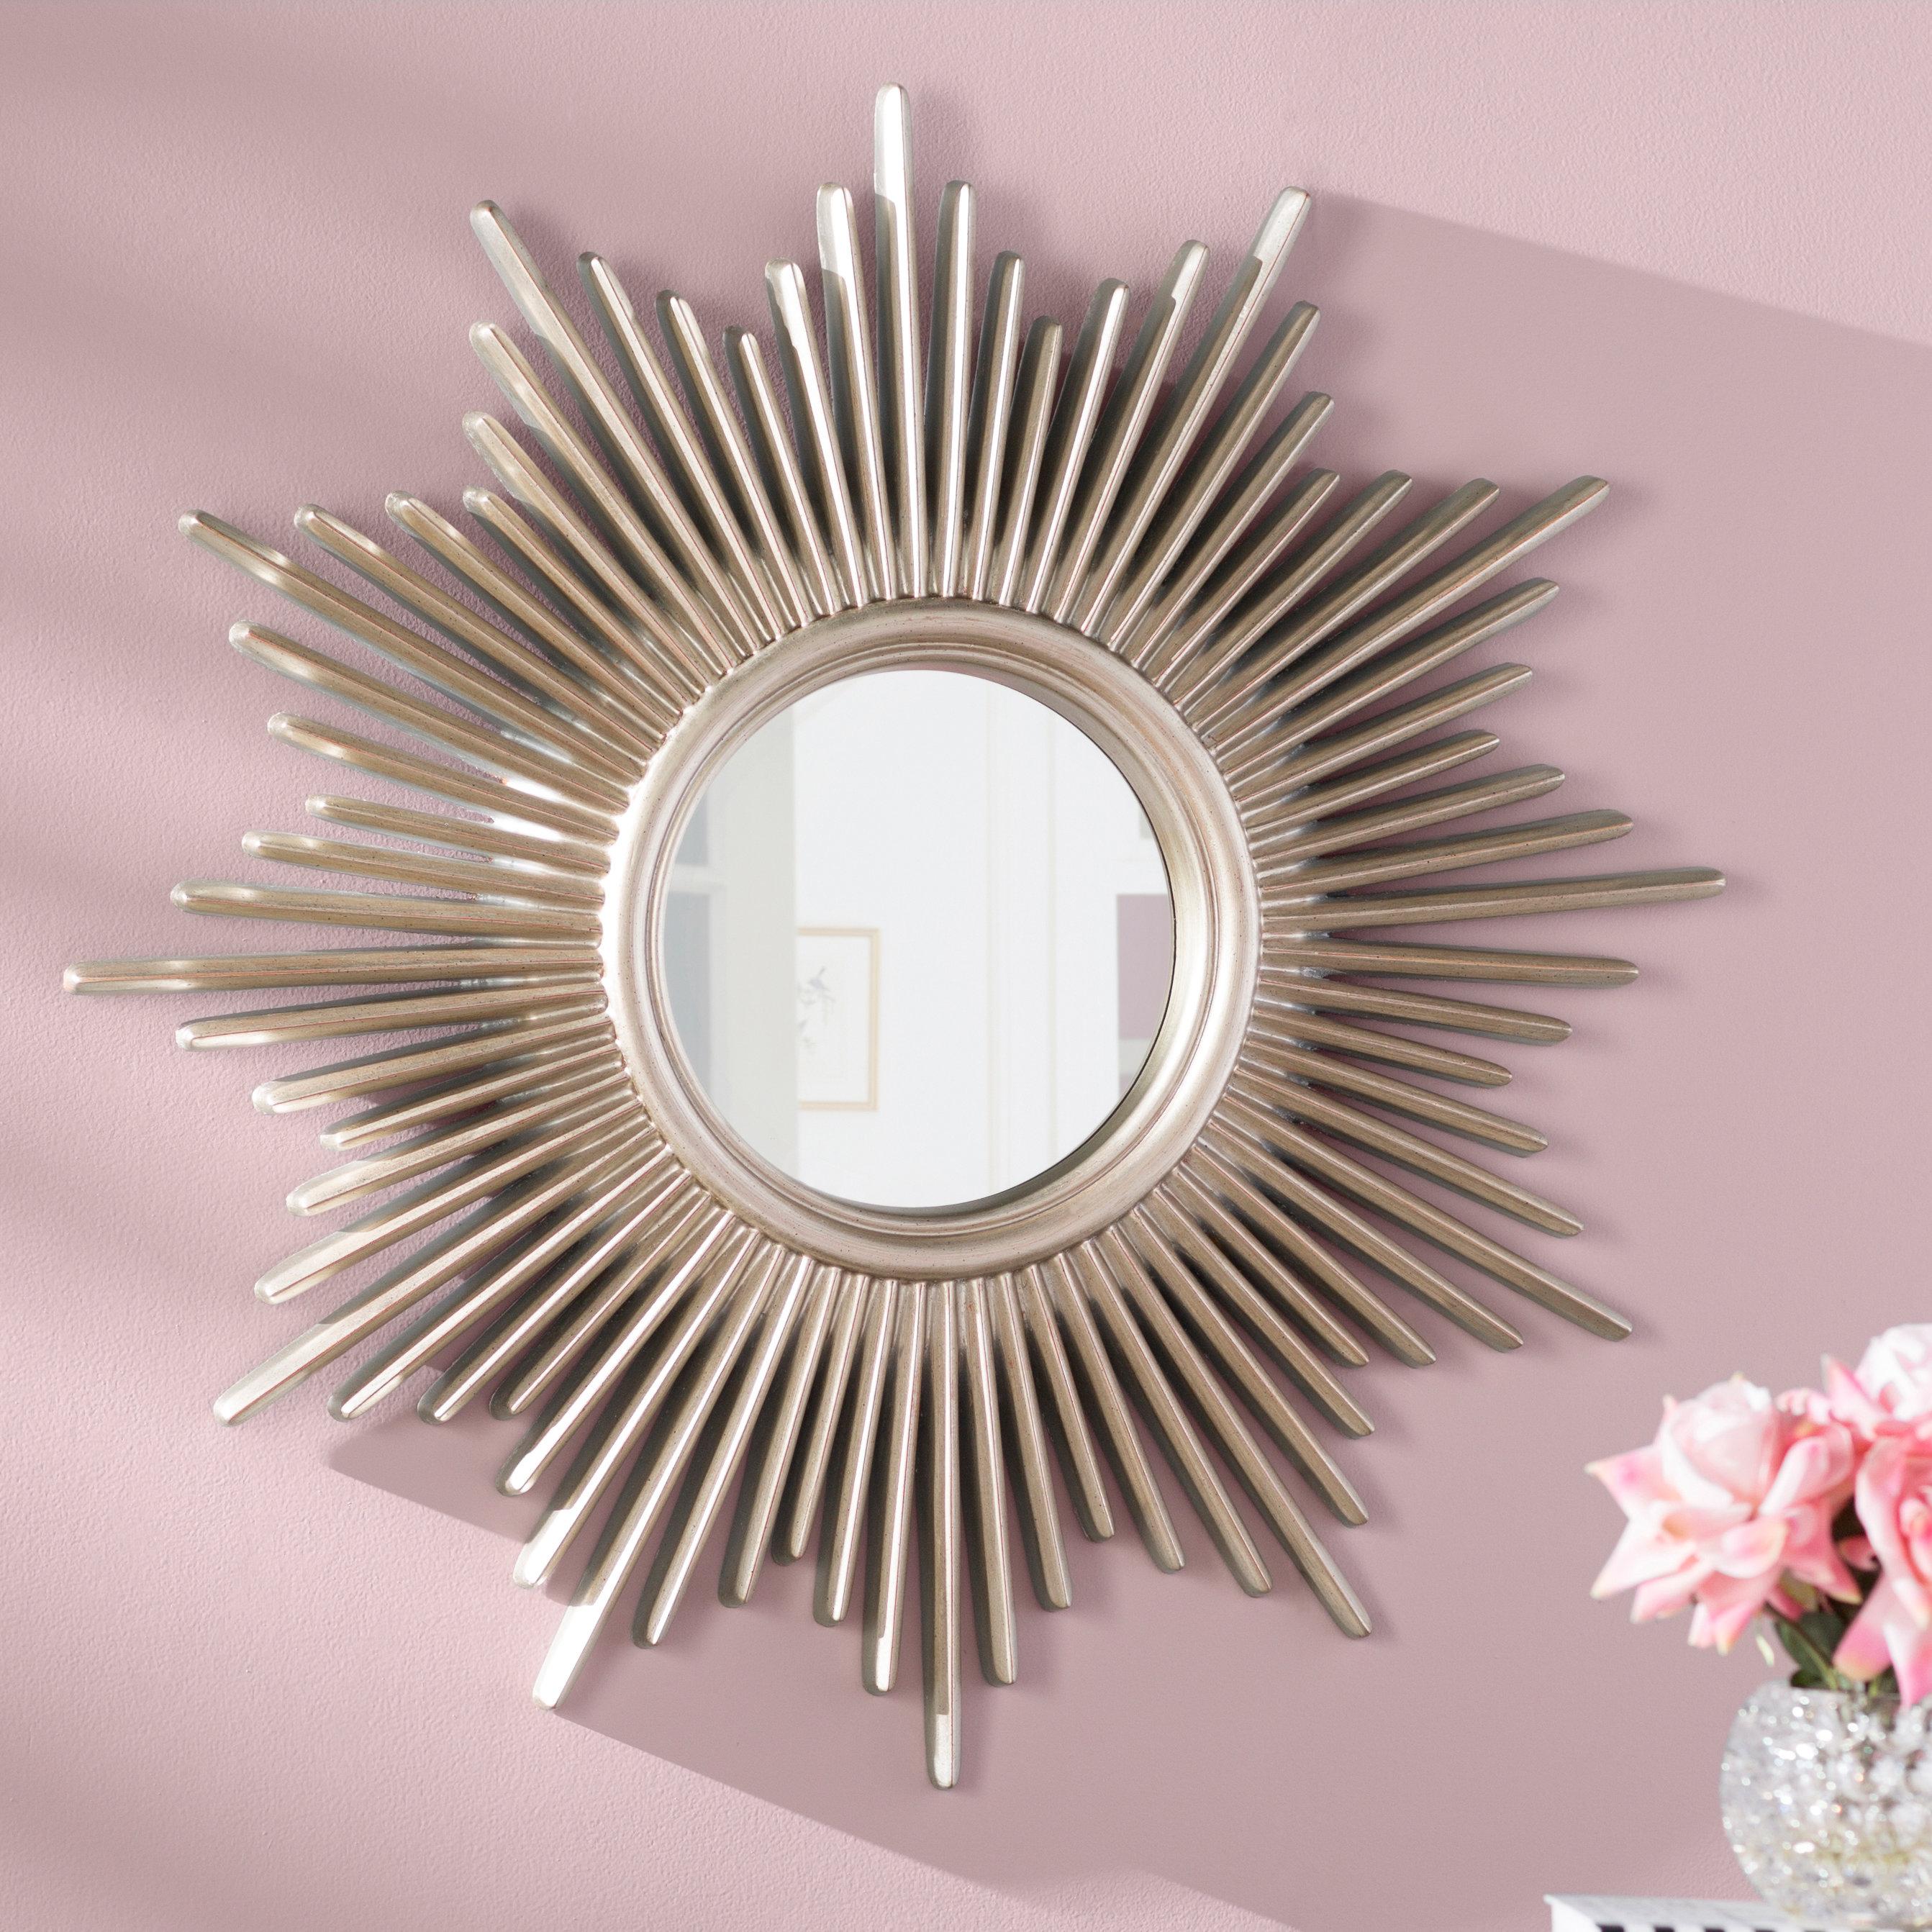 Josephson Starburst Glam Beveled Accent Wall Mirror In Josephson Starburst Glam Beveled Accent Wall Mirrors (View 2 of 22)